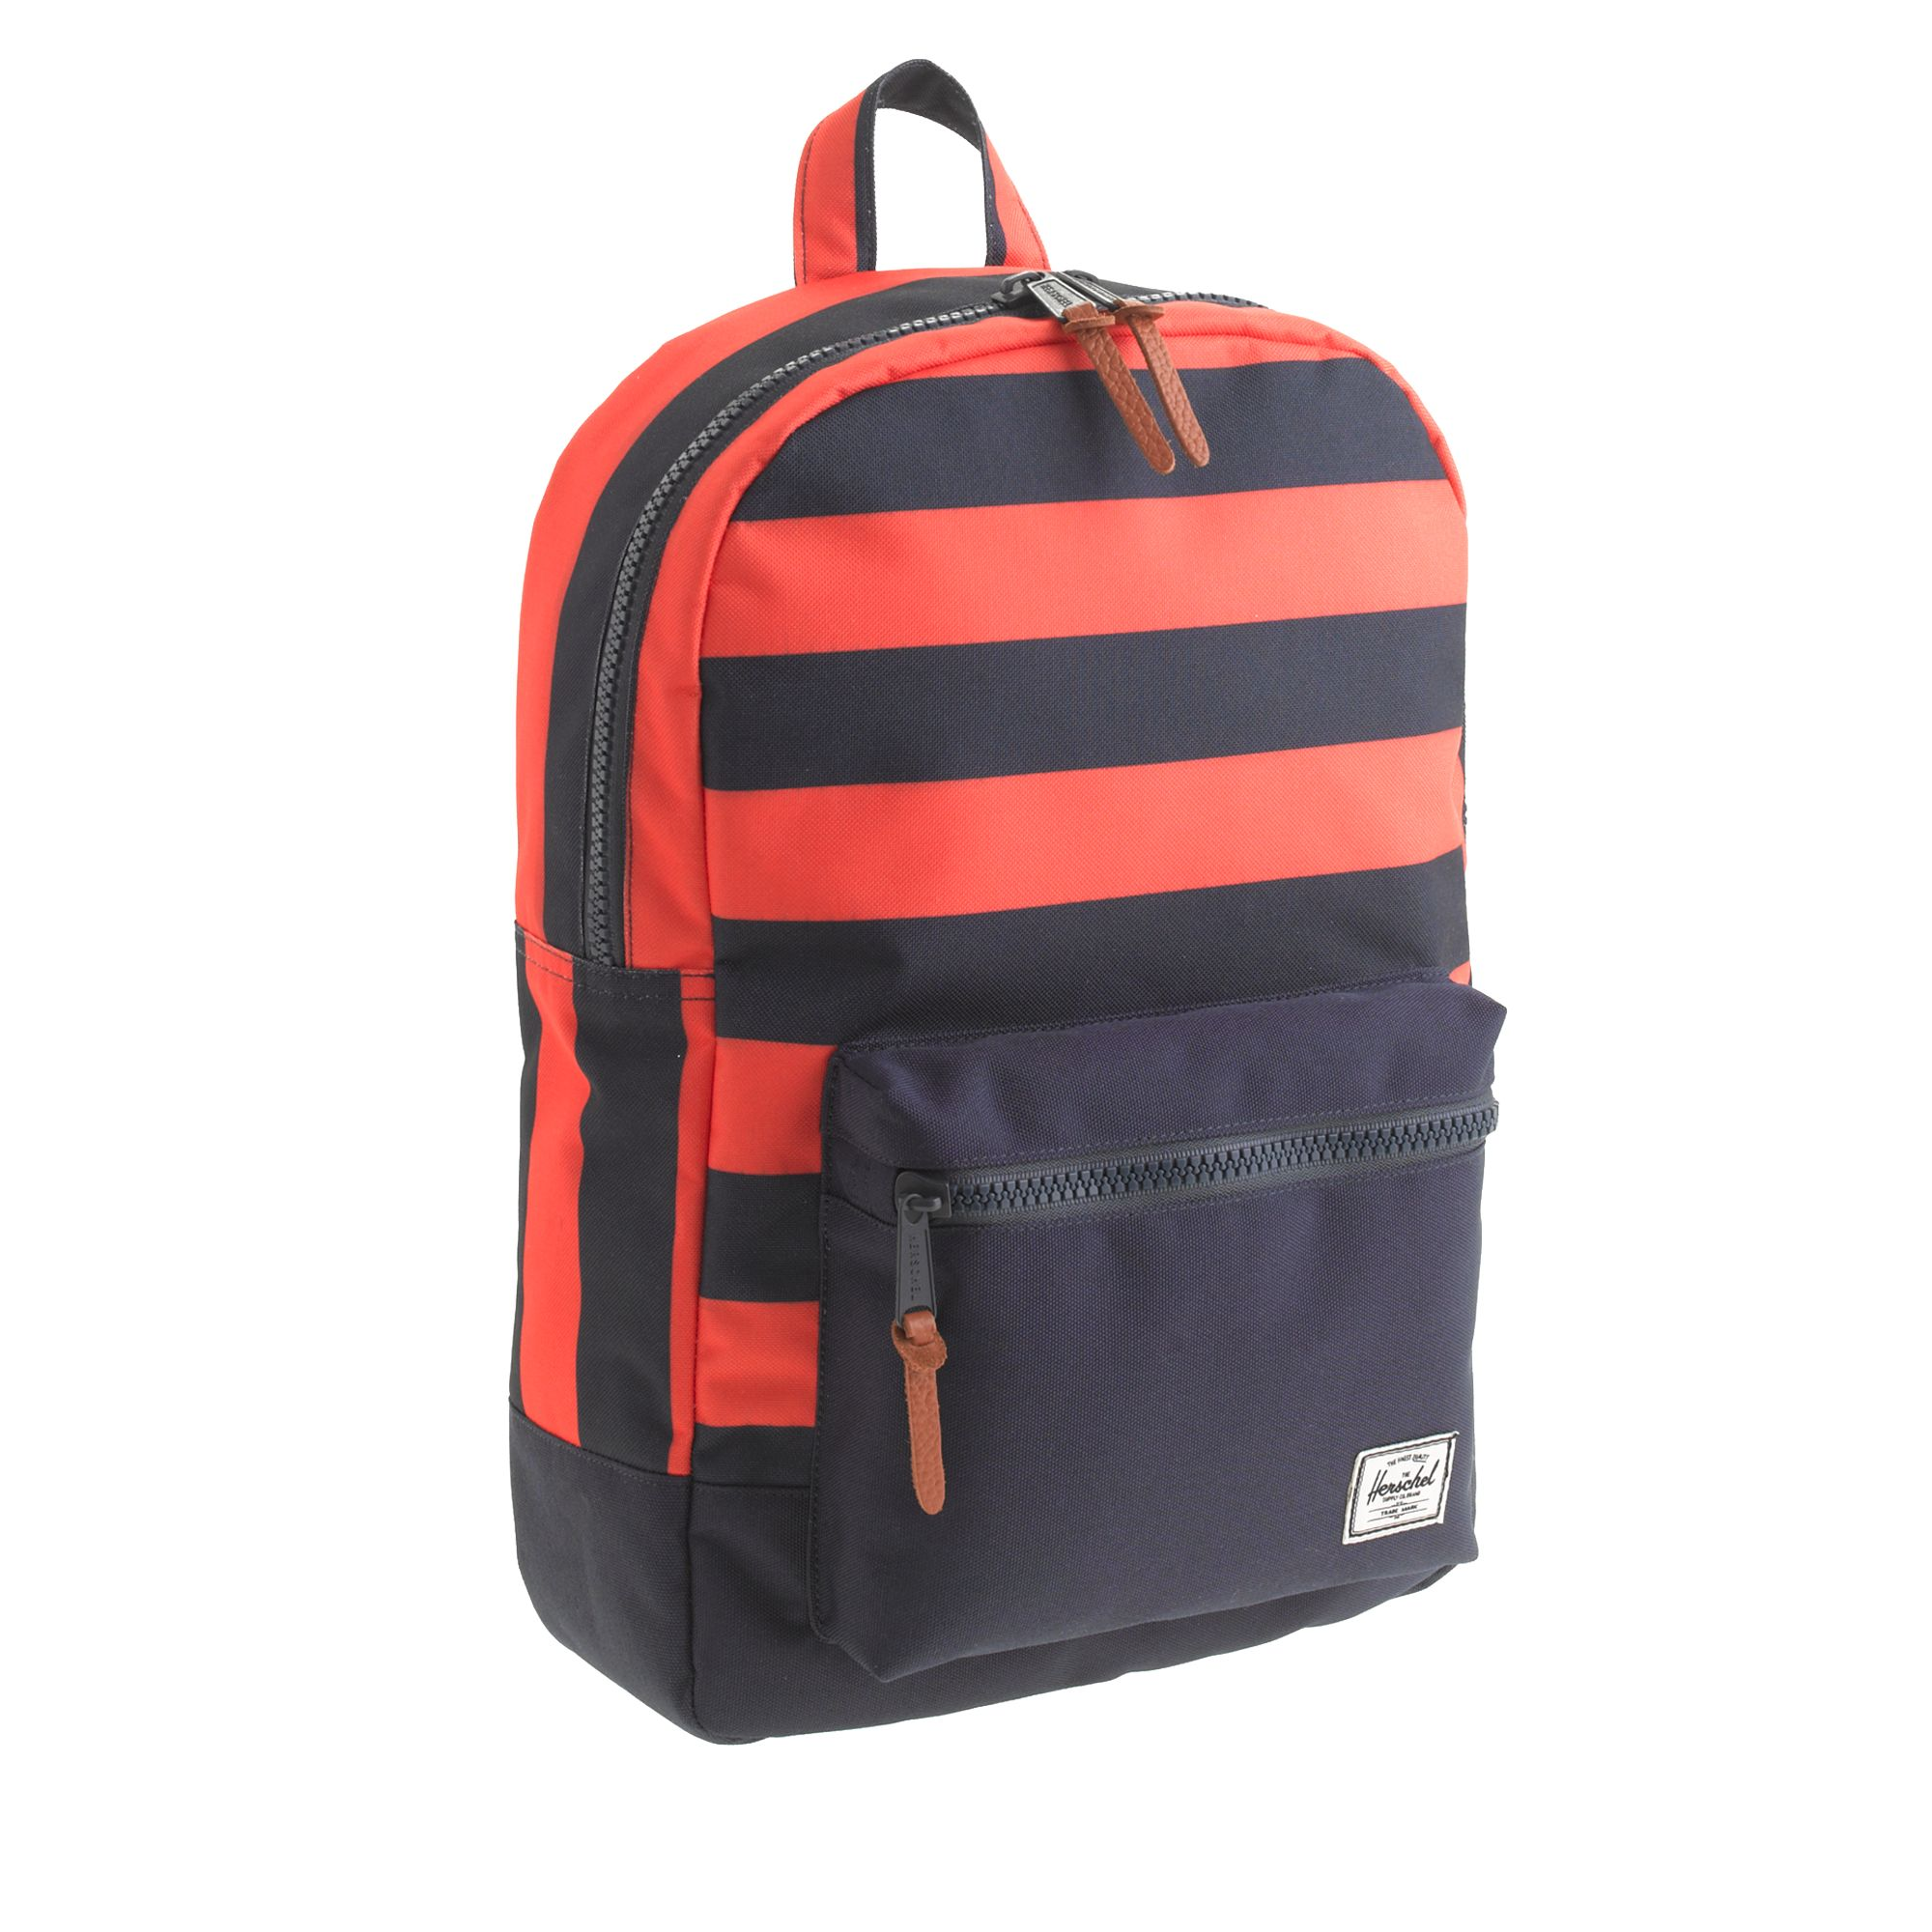 Herschel Supply Co Settlement Backpack: J.crew Herschel Supply Co For Crewcuts Settlement Backpack